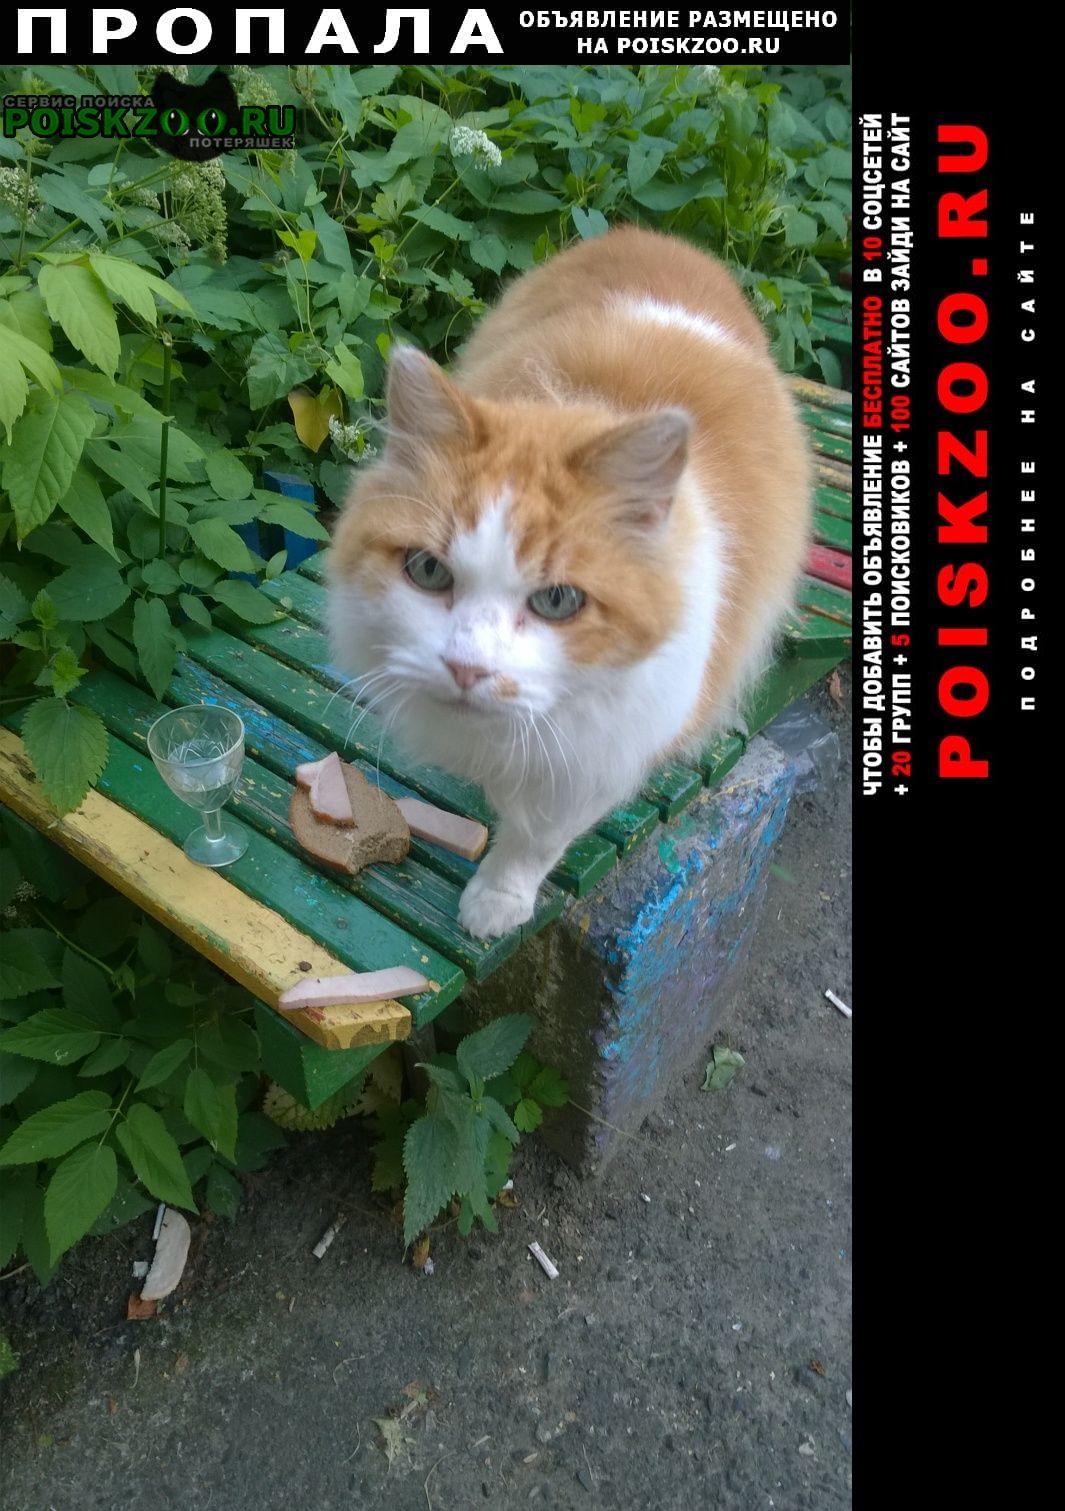 Пропал кот 12 лет ул чкалова 19/3 Витебск